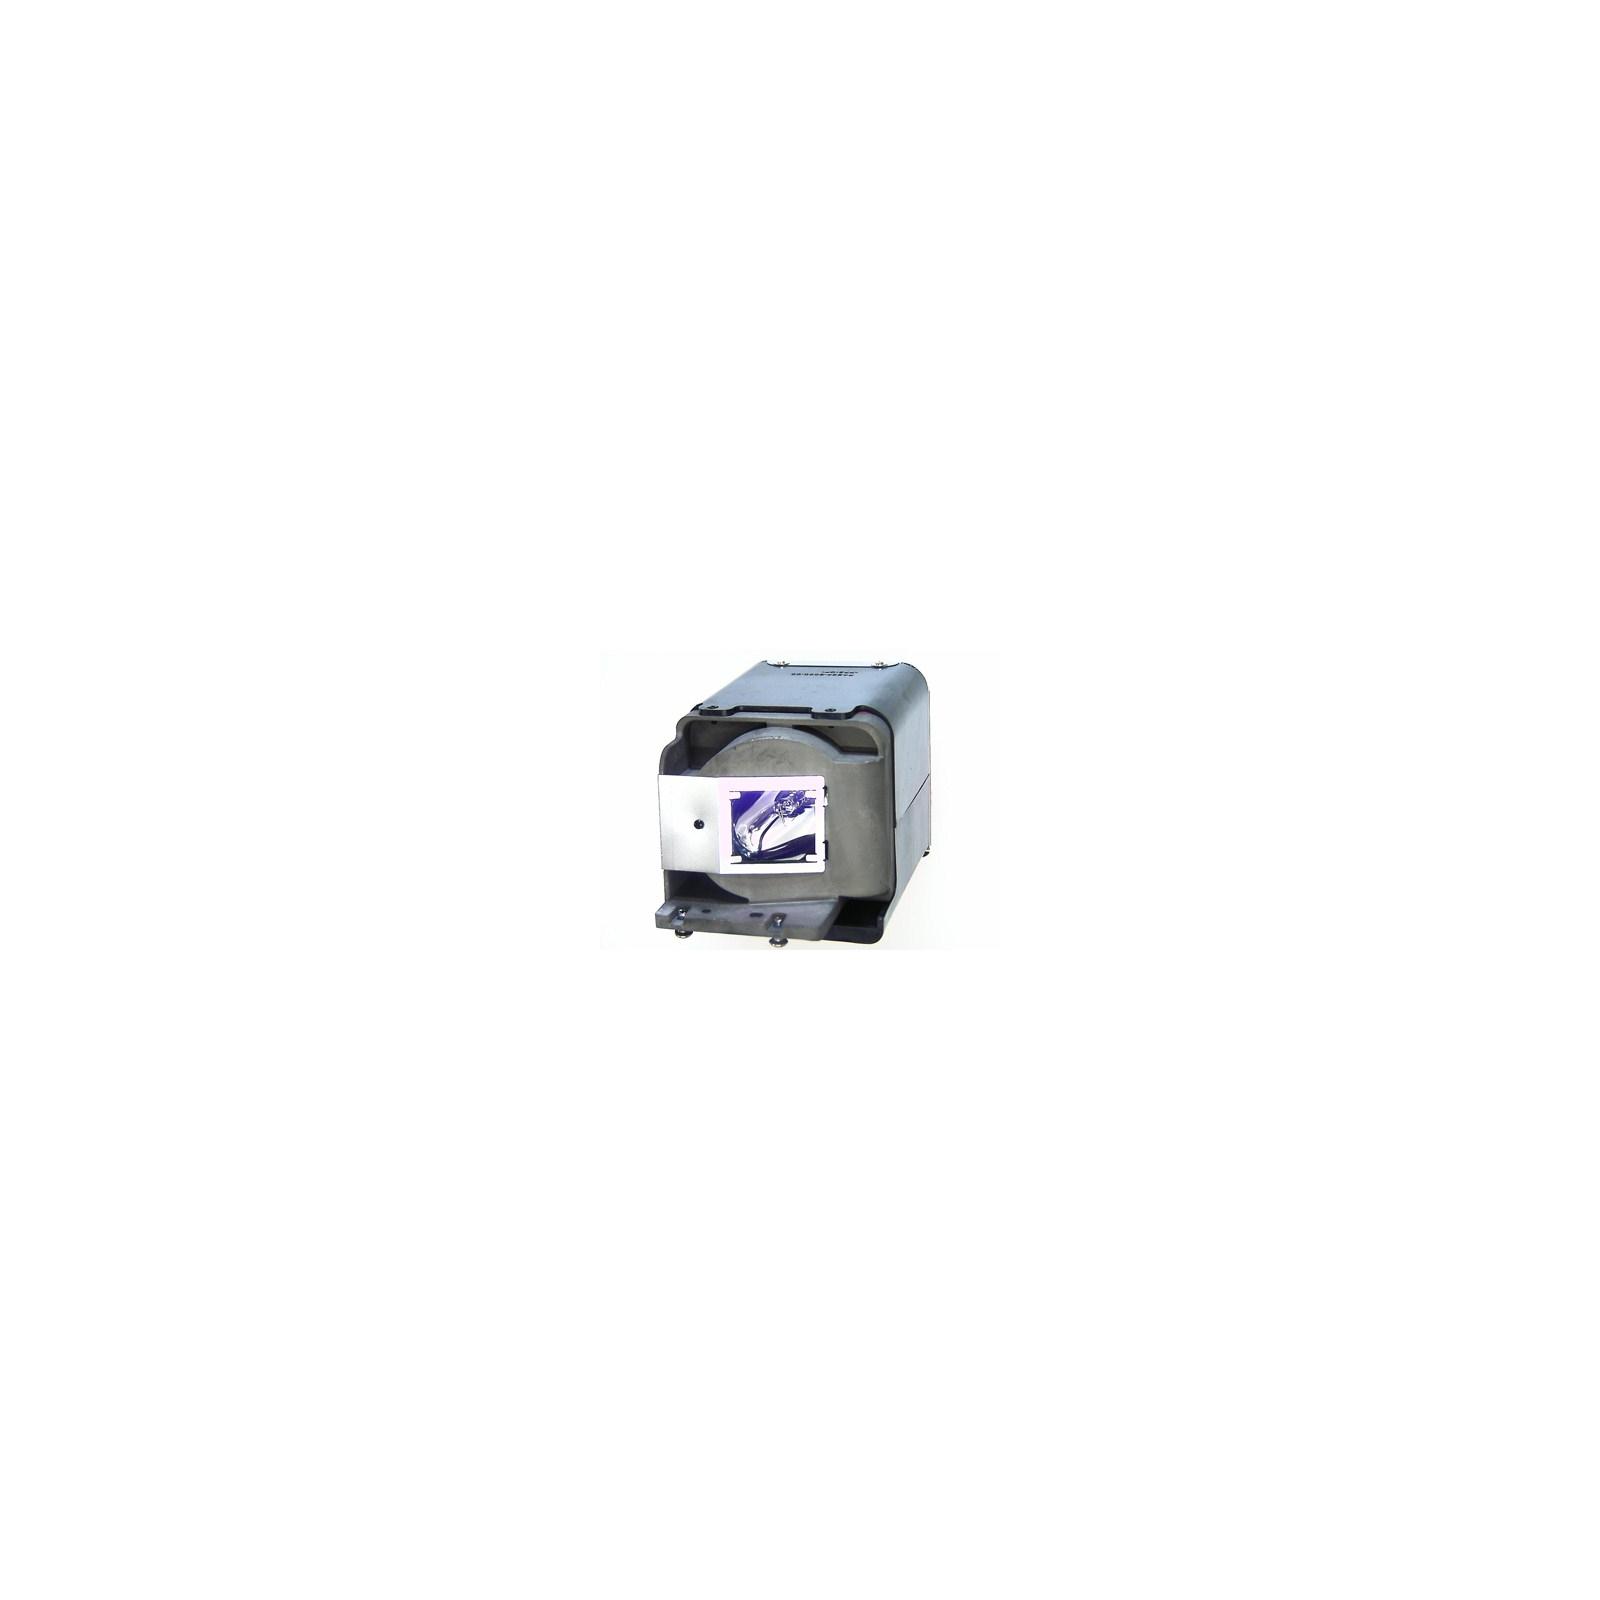 Лампа проектора Viewsonic RLC-049 (VS12462)